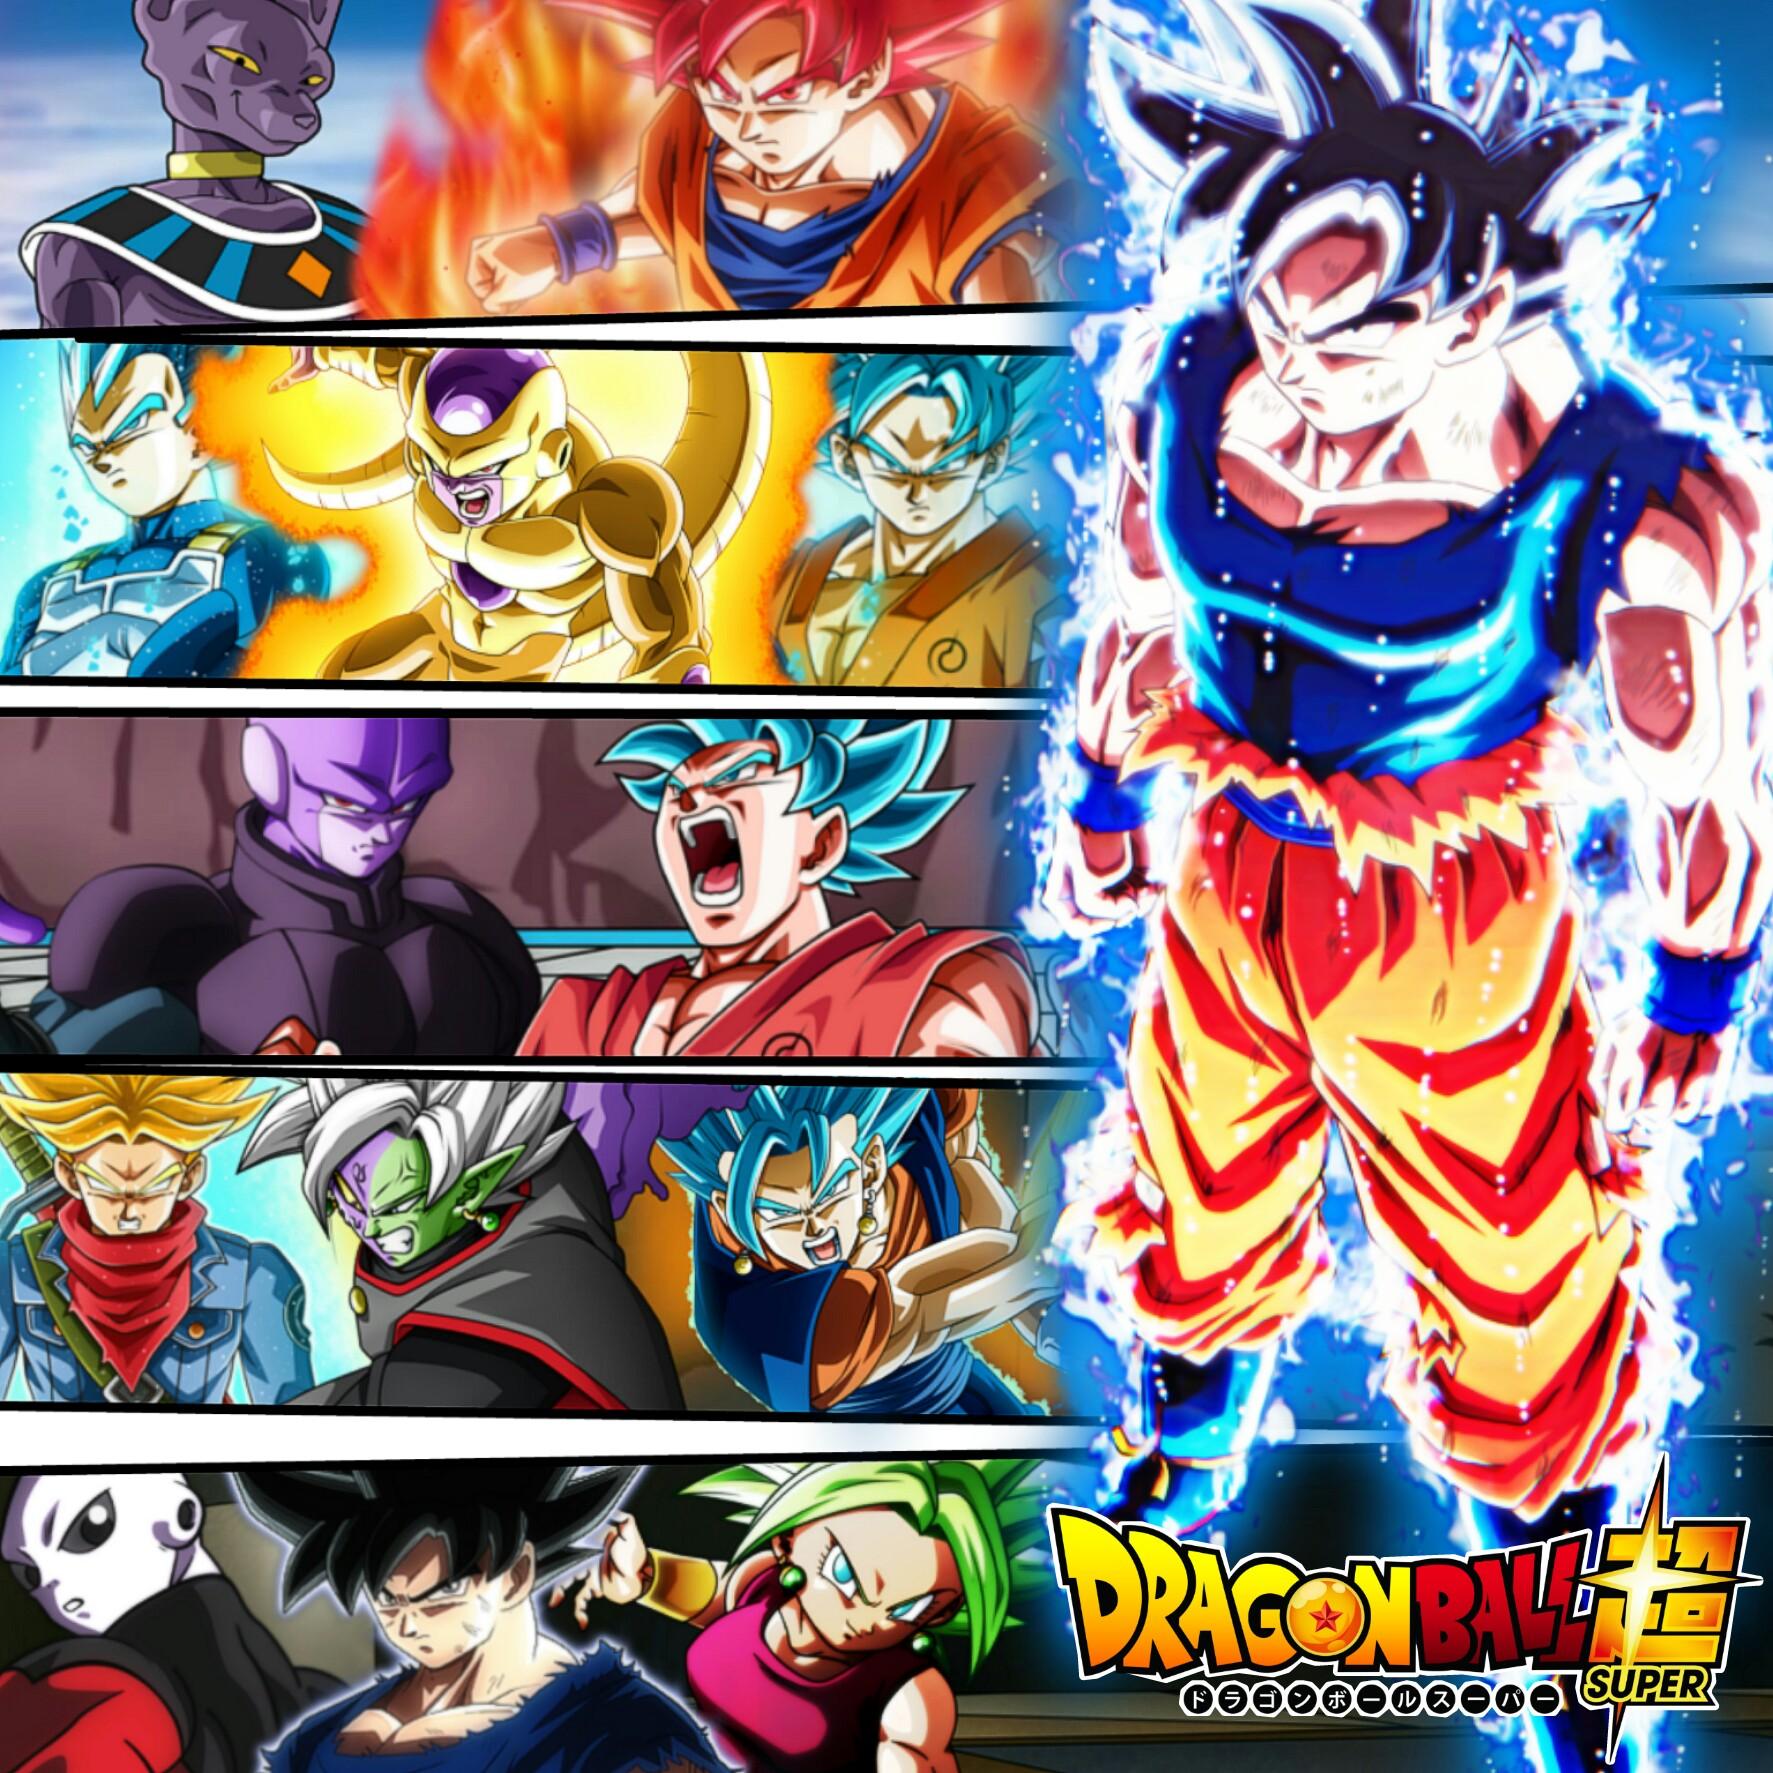 Dragon Ball Manga Tournament Of Power: Poster Dragon Ball Super. By ImedJimmy On DeviantArt